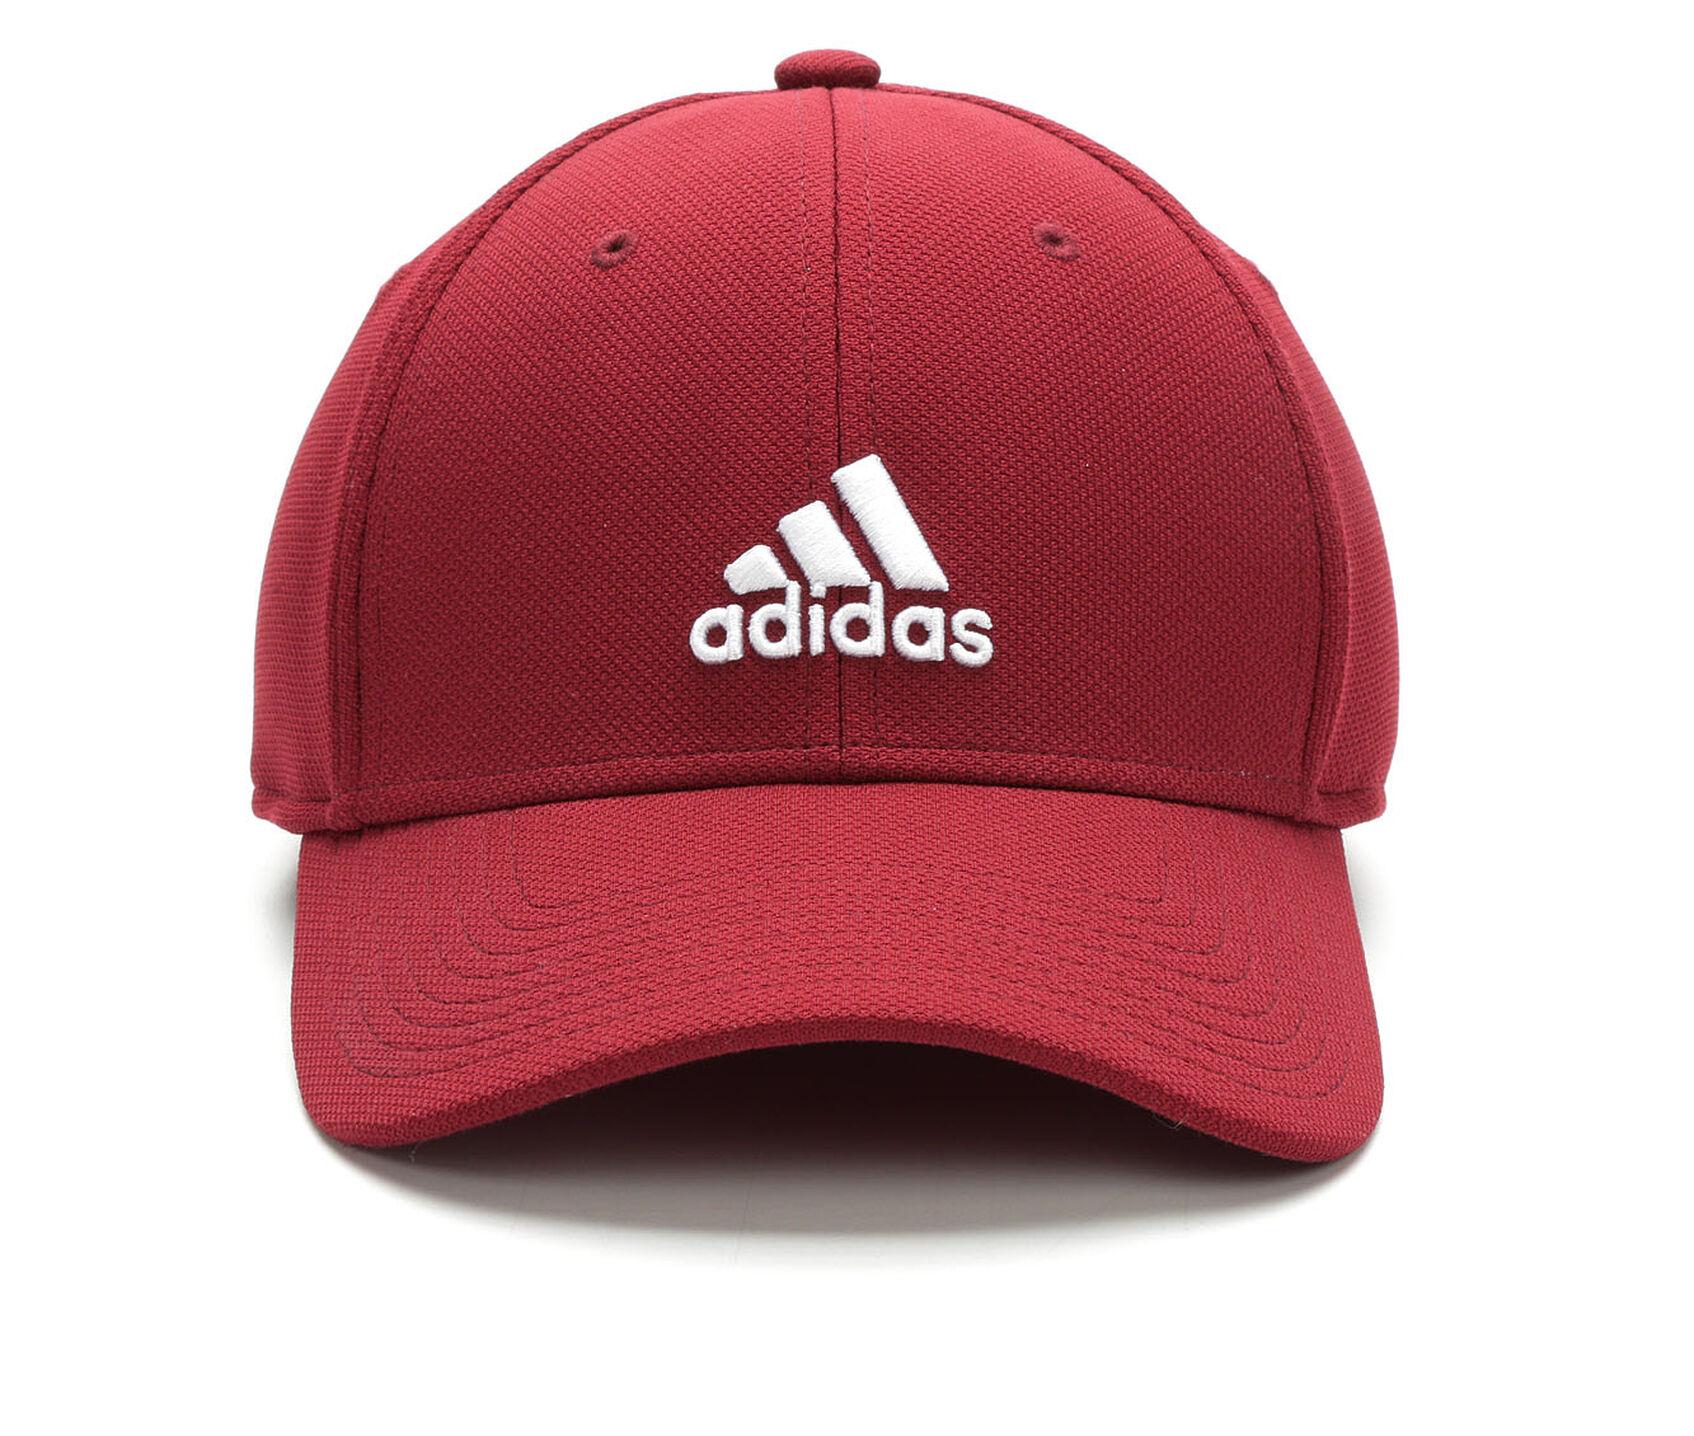 8acf8769ff8 Adidas Men s Rucker Stretch Fit Baseball Cap